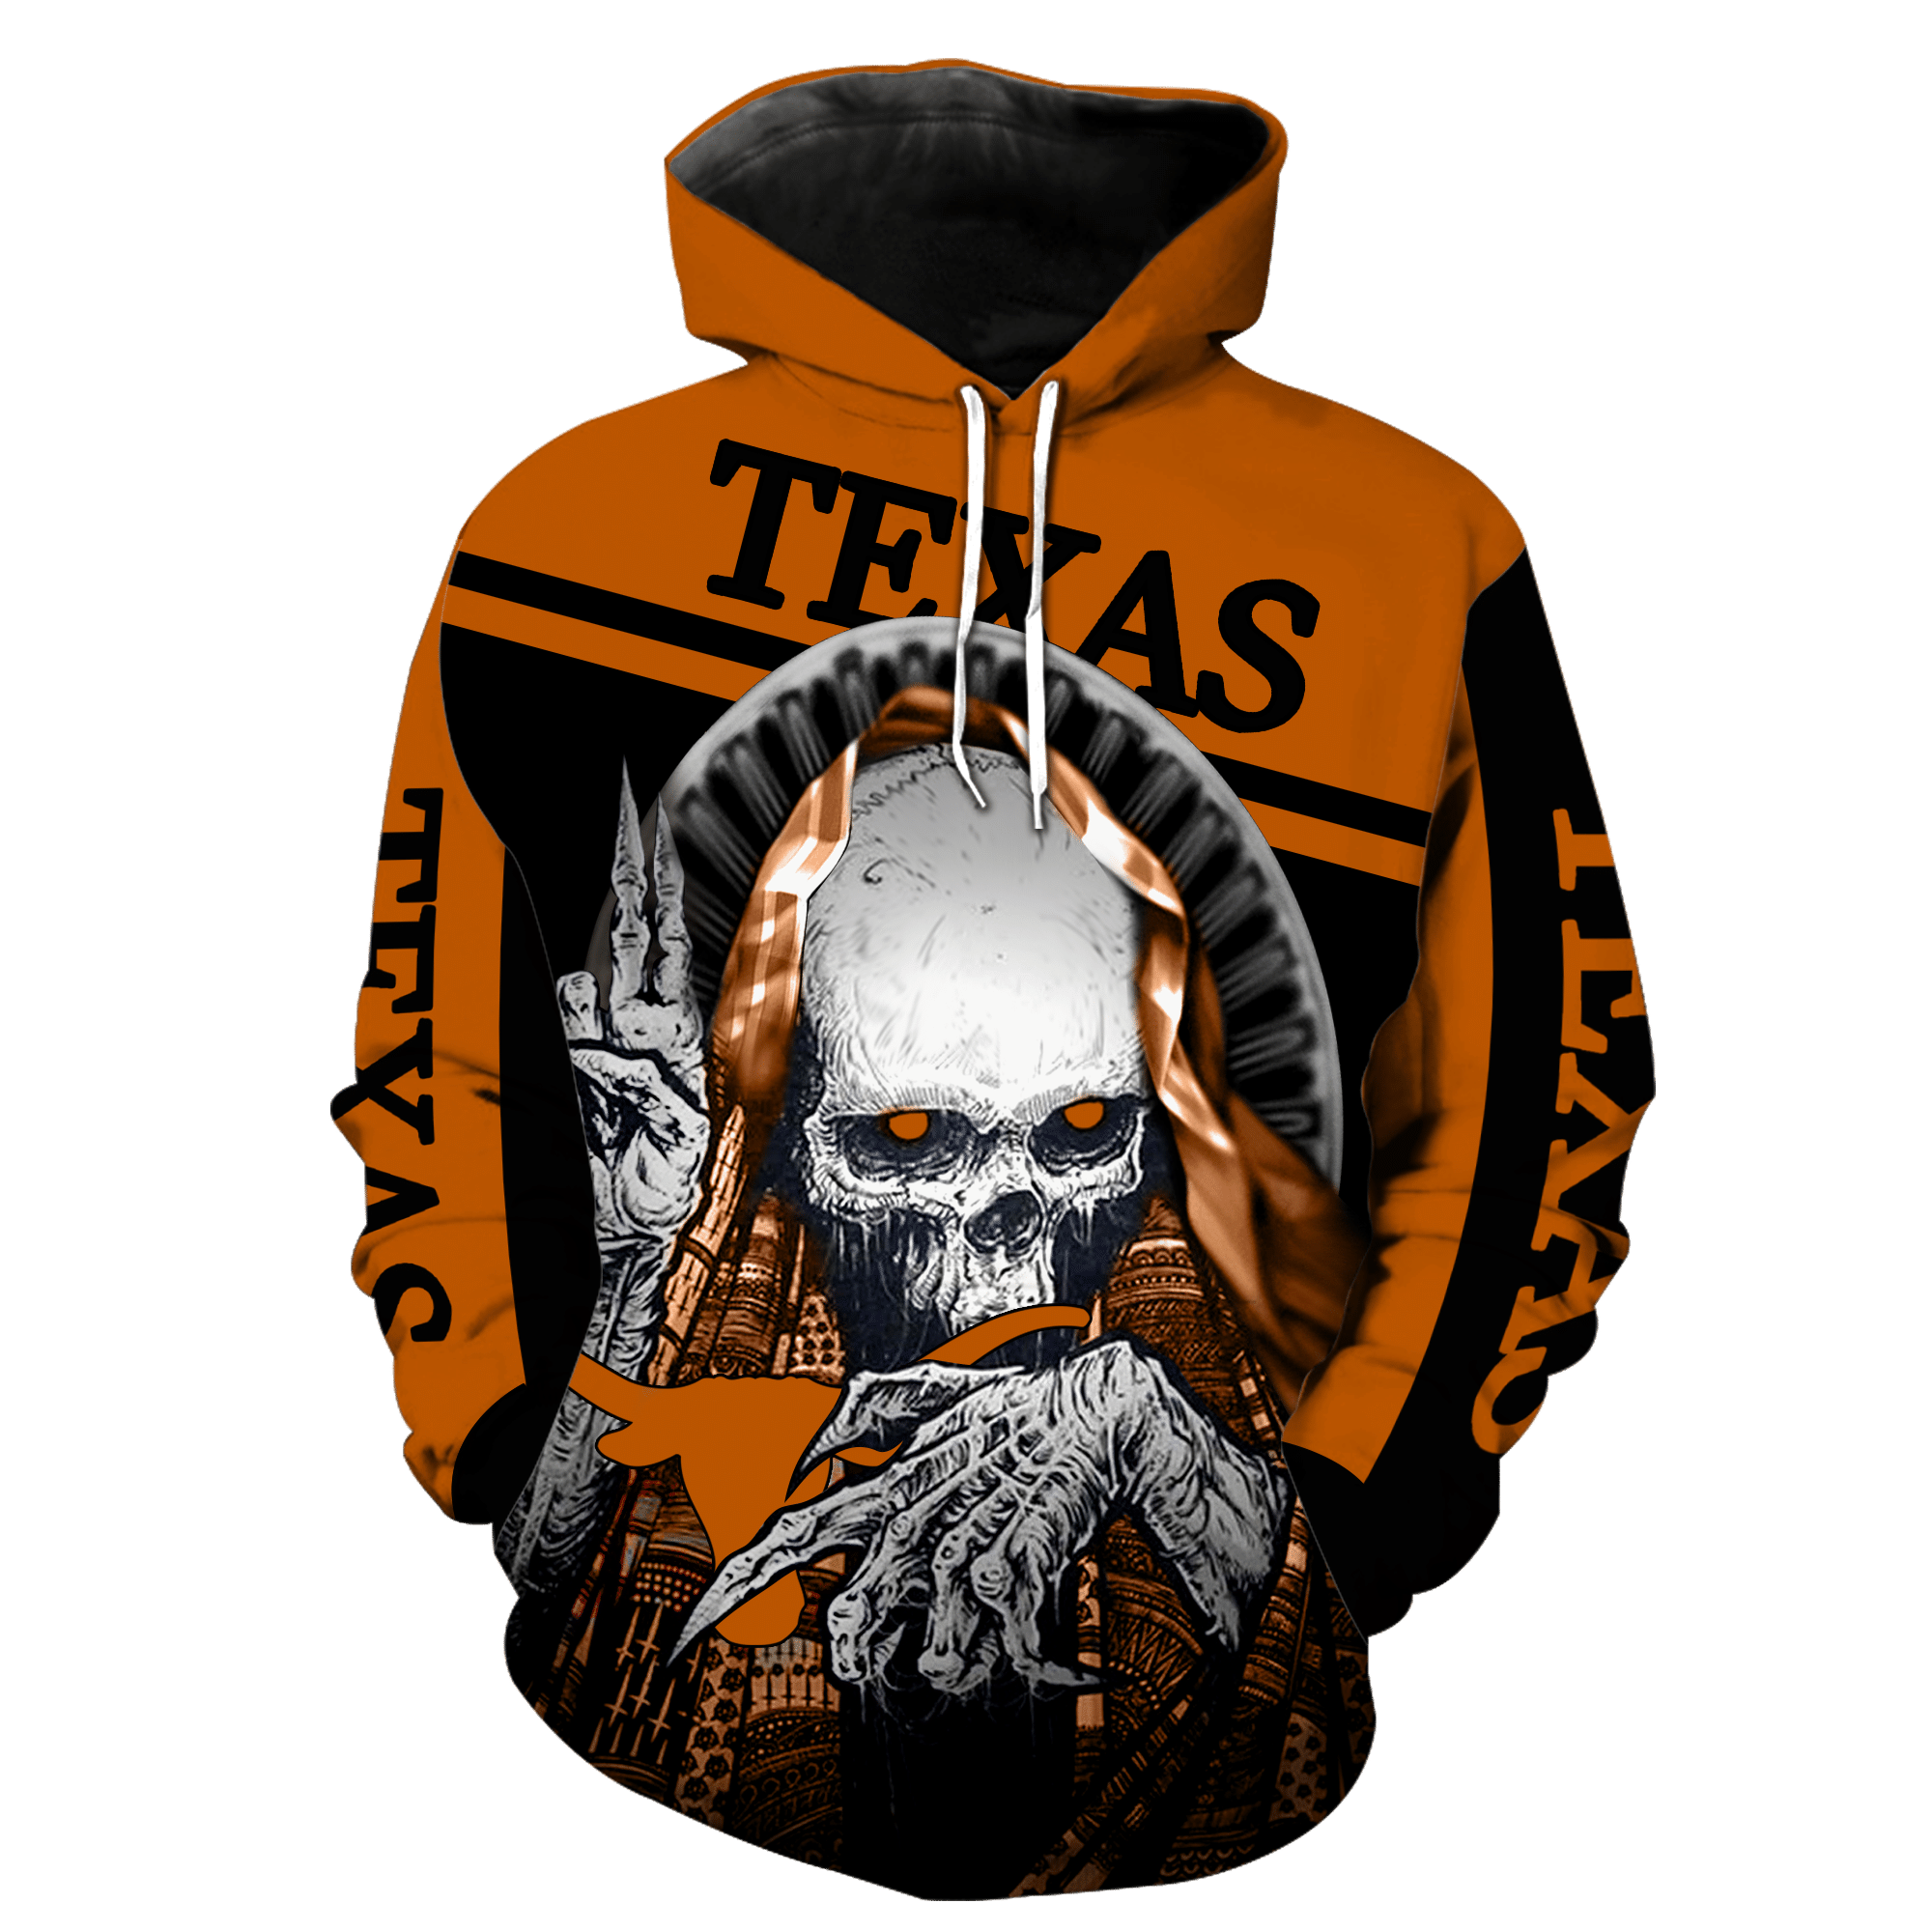 NCAA Texas Longhorns Skull Hoodie and T-shirt